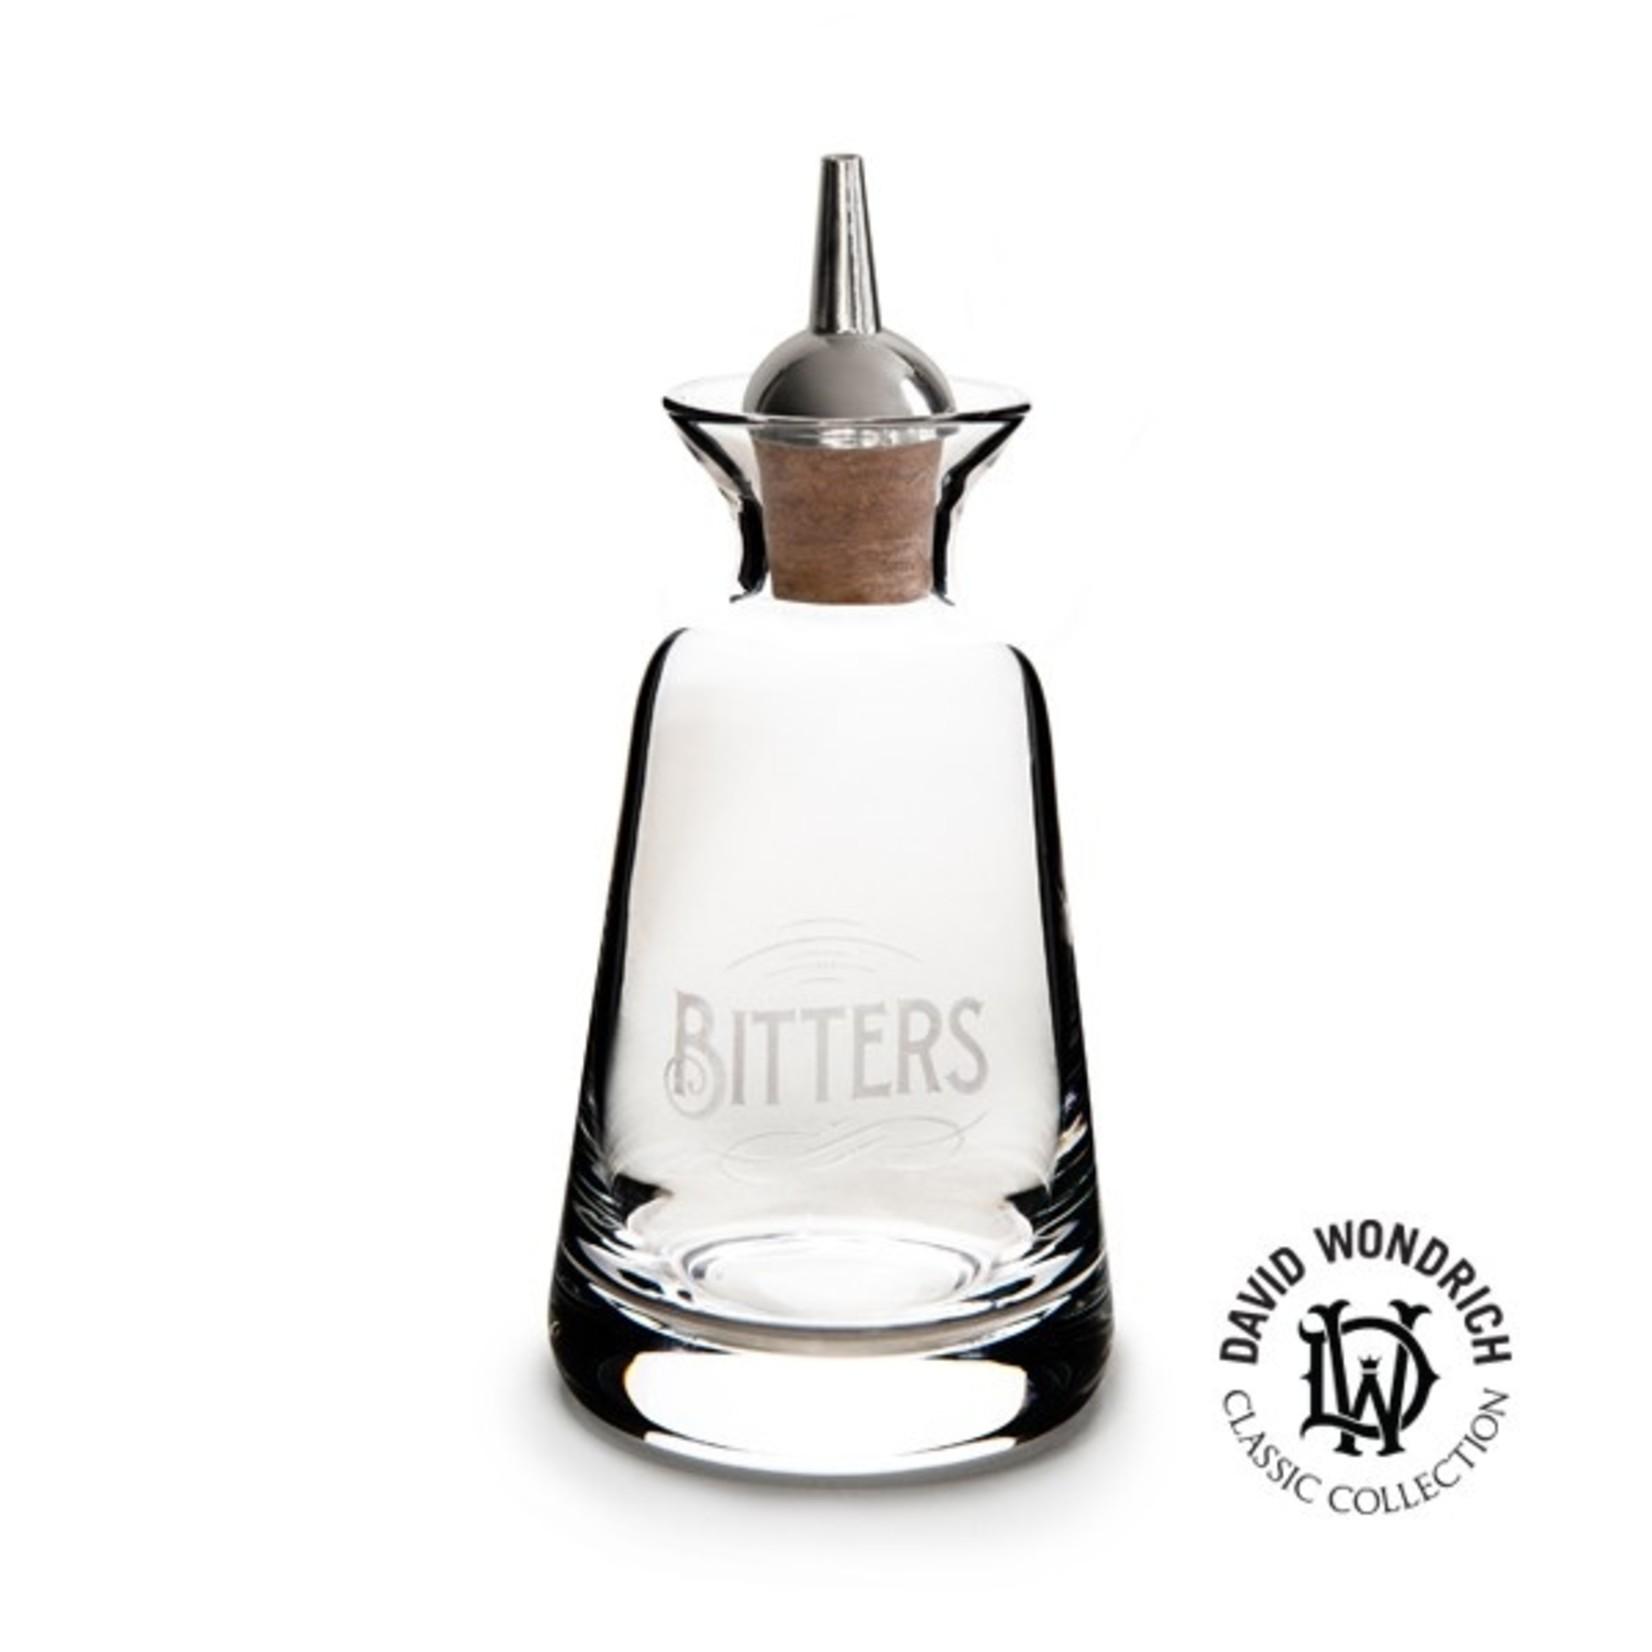 Cocktail Kingdom Finewell Bitters Bottle